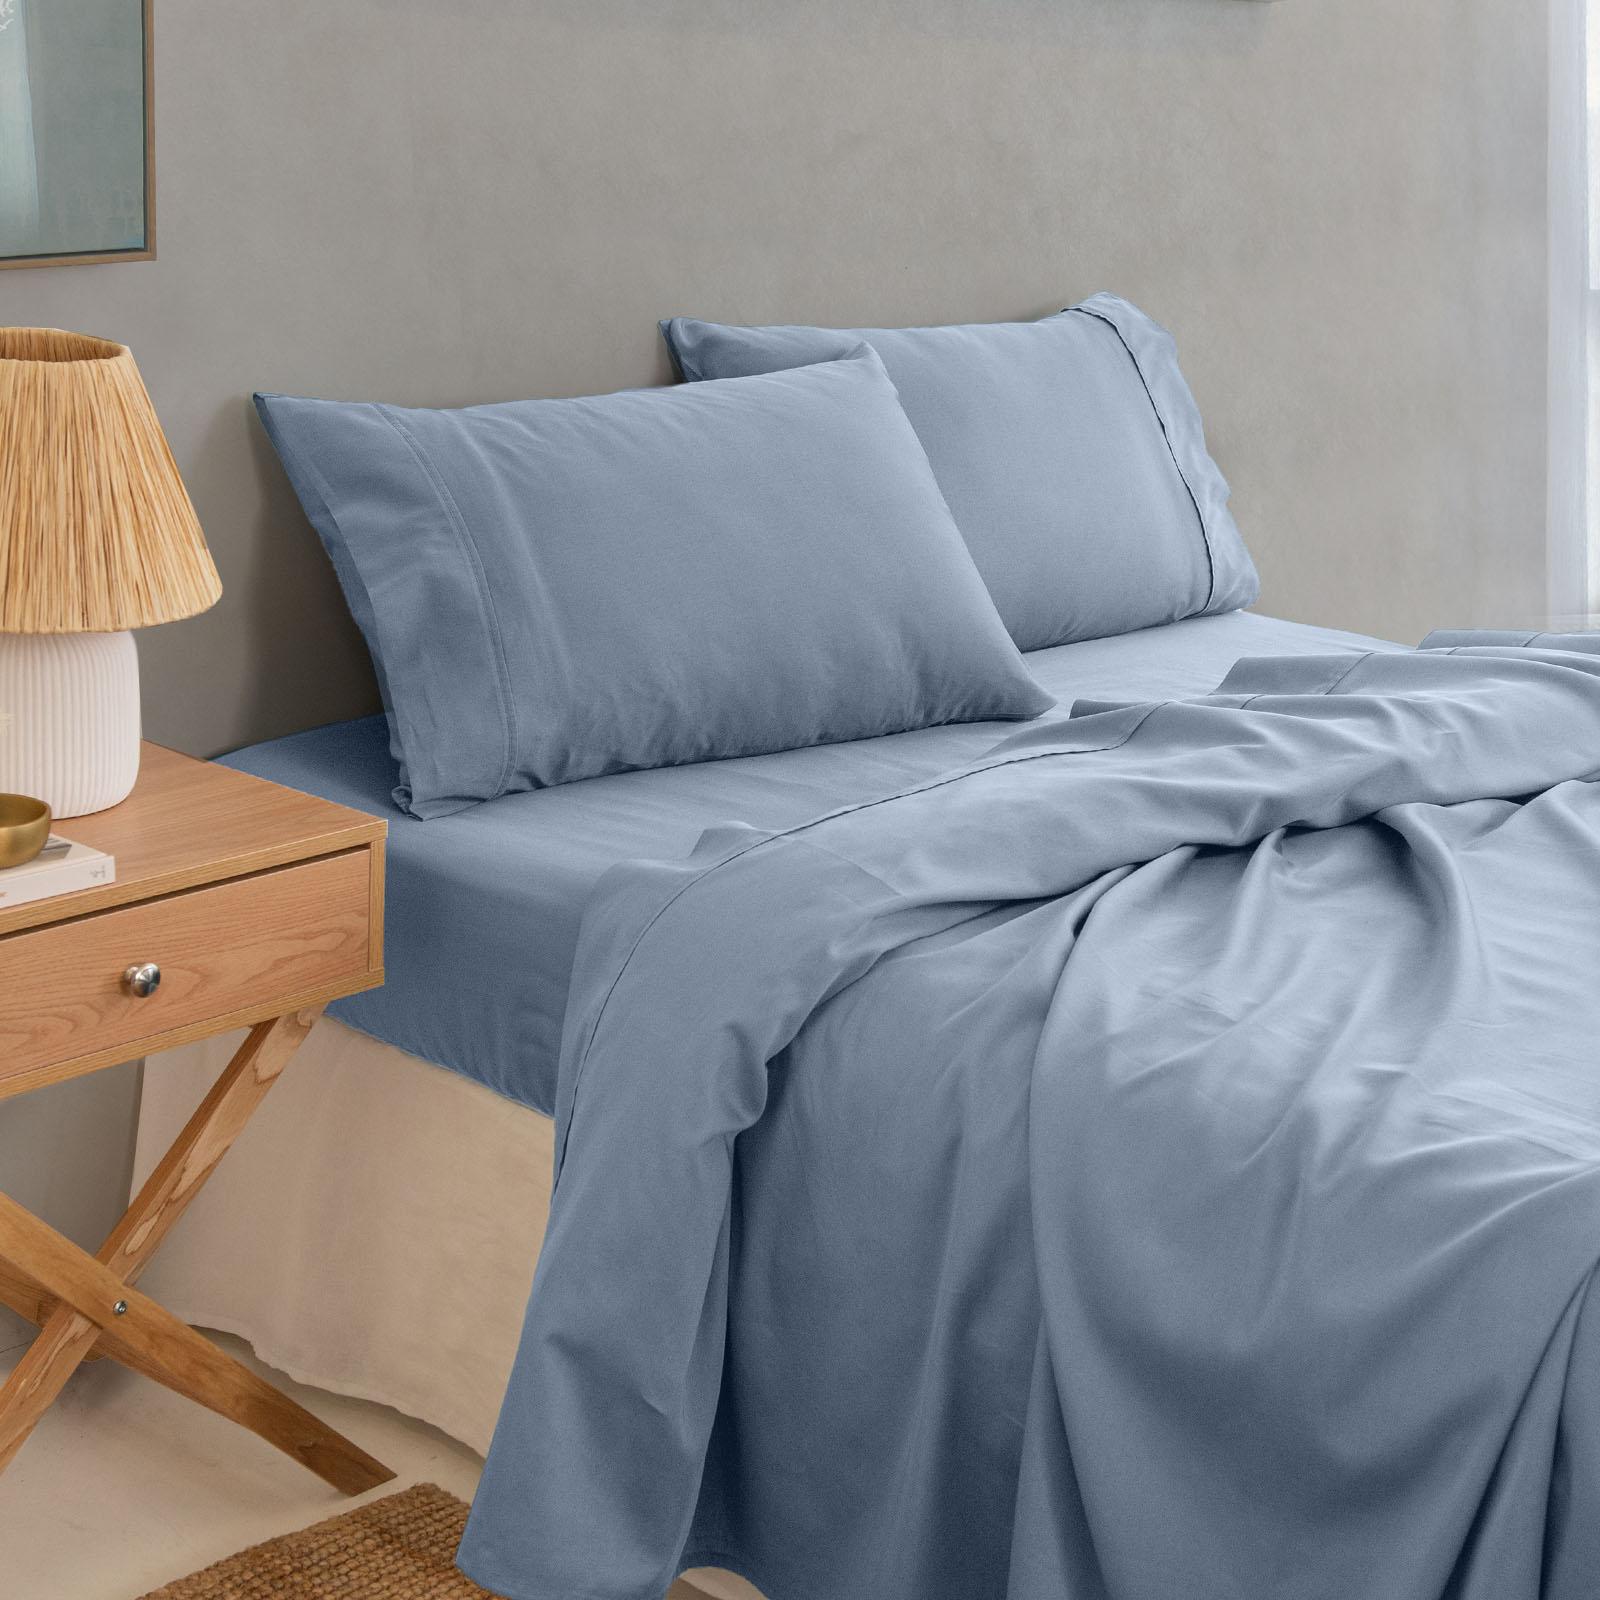 thumbnail 12 - Royal Comfort 1000TC Hotel Grade Bamboo Cotton Sheets Pillowcases Set Ultrasoft